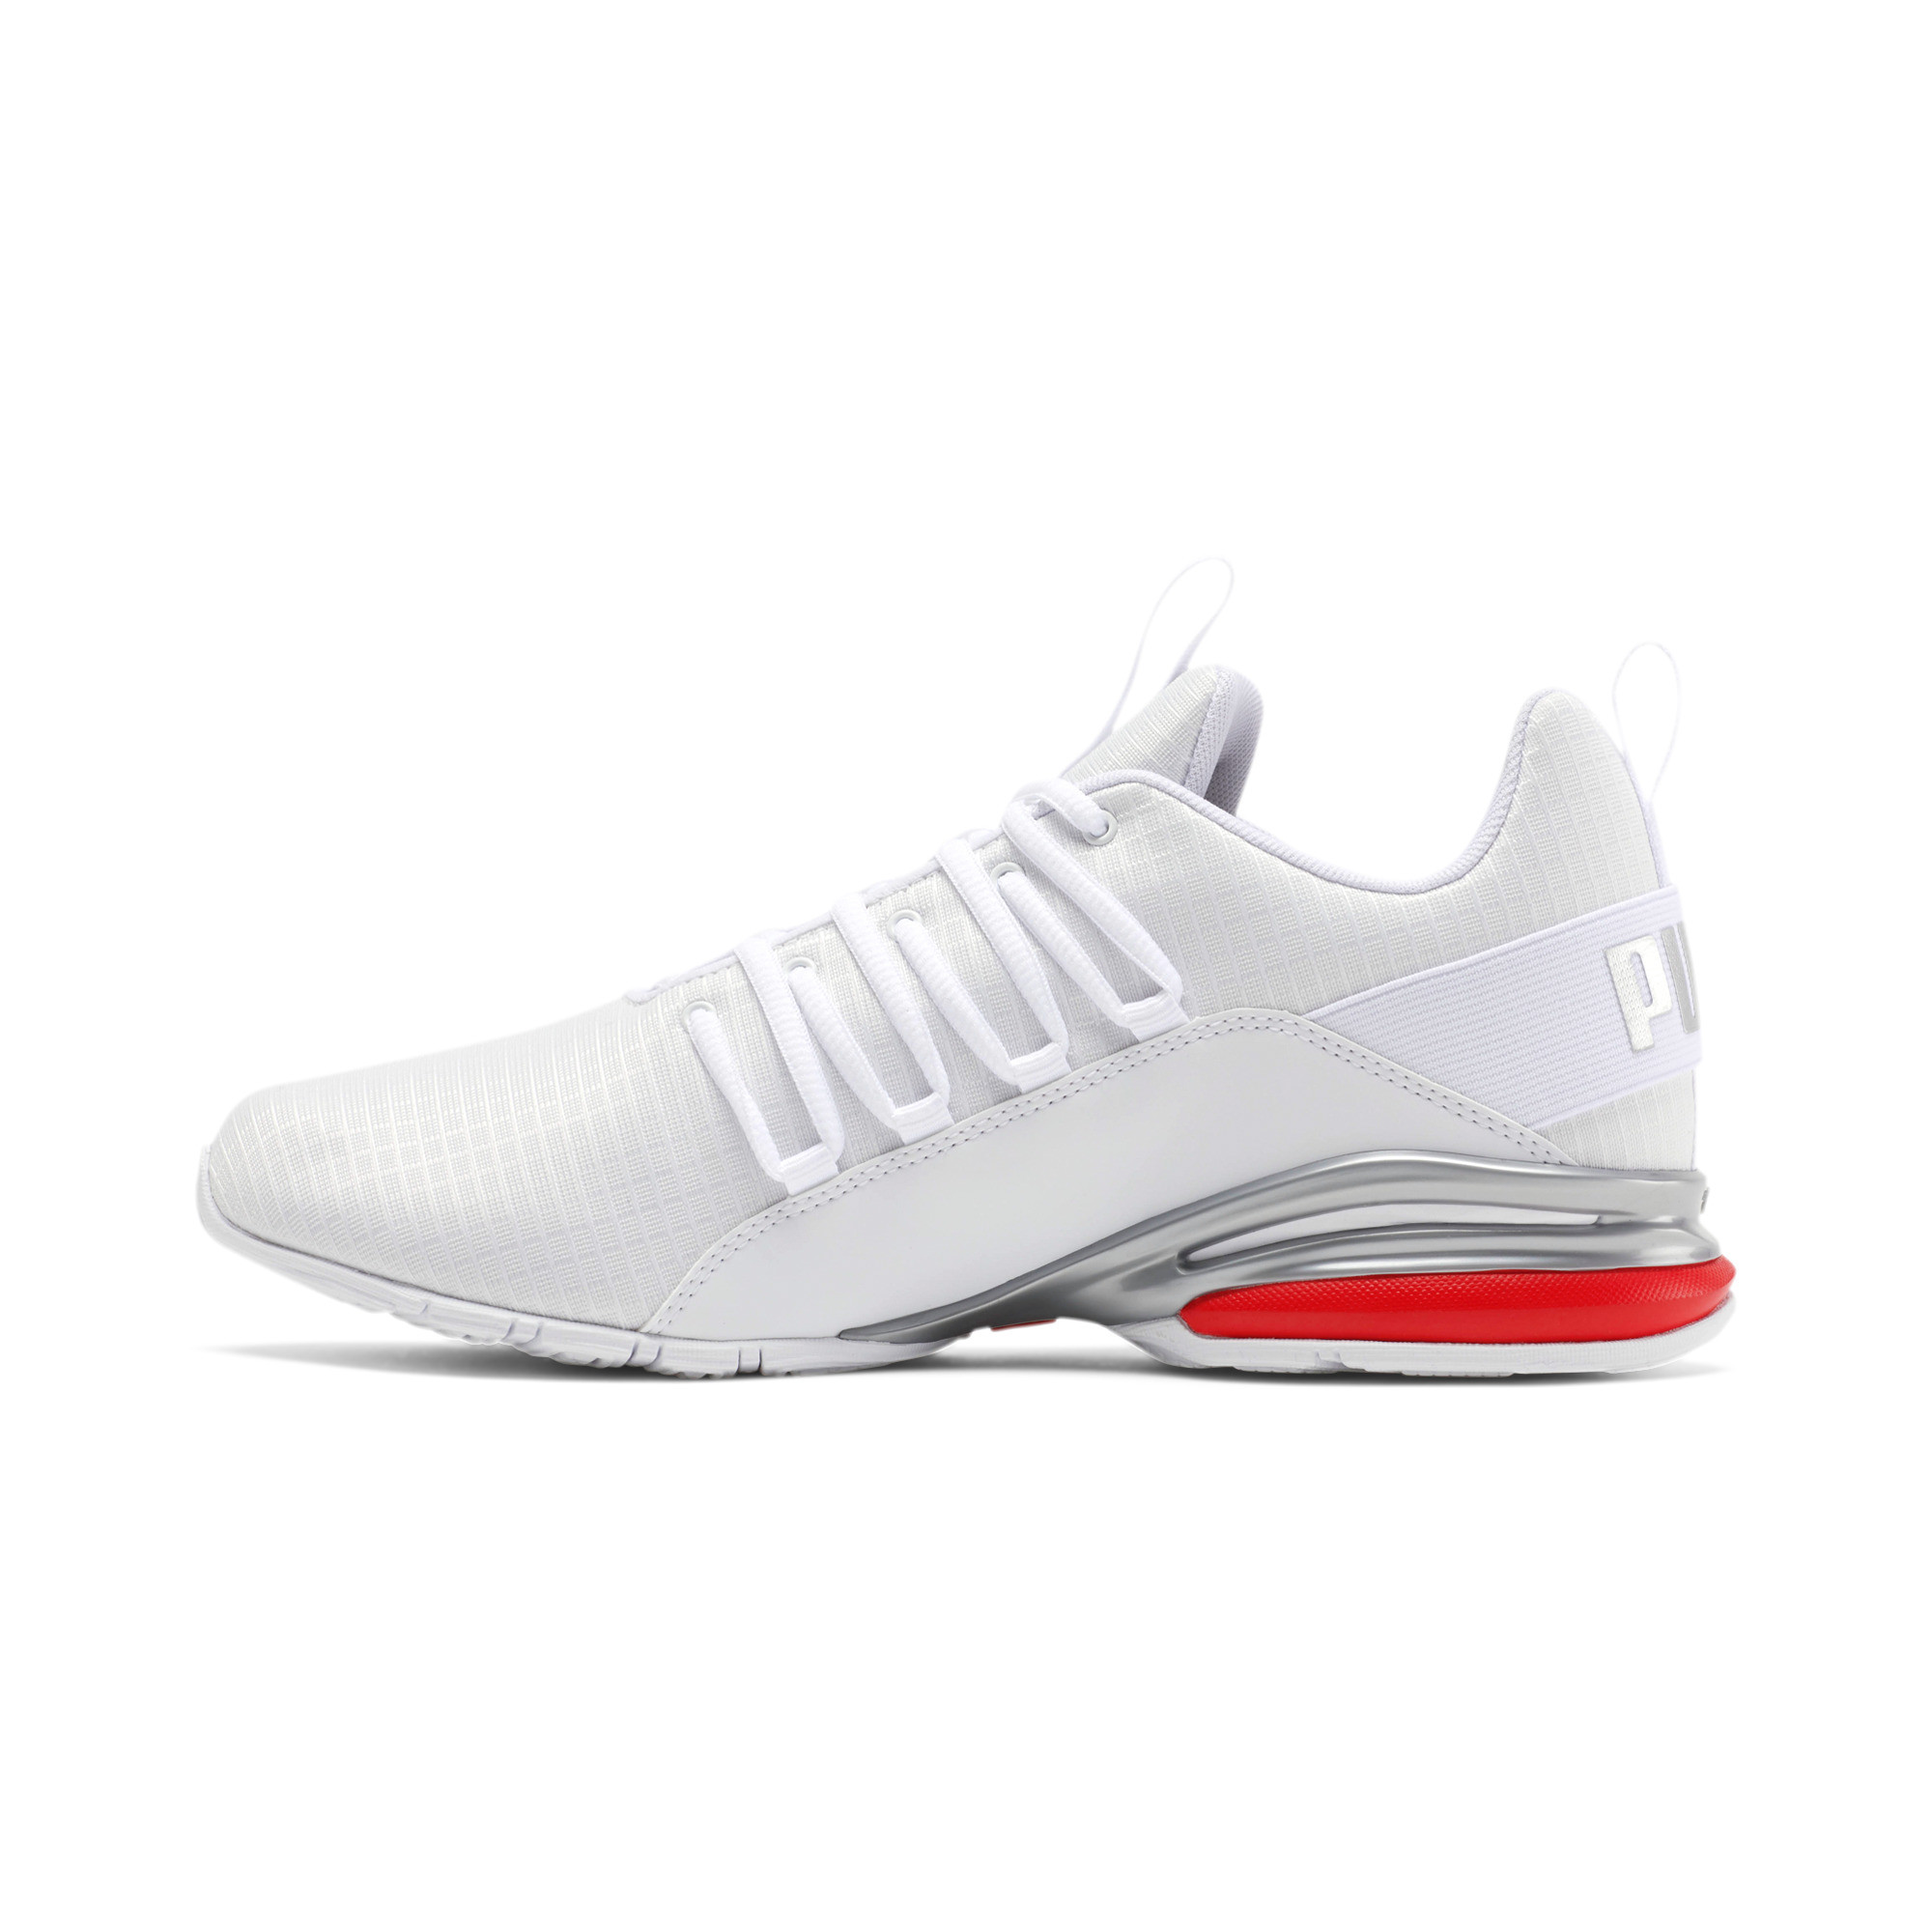 PUMA-Men-039-s-Momenta-Ripstop-Training-Shoes thumbnail 4